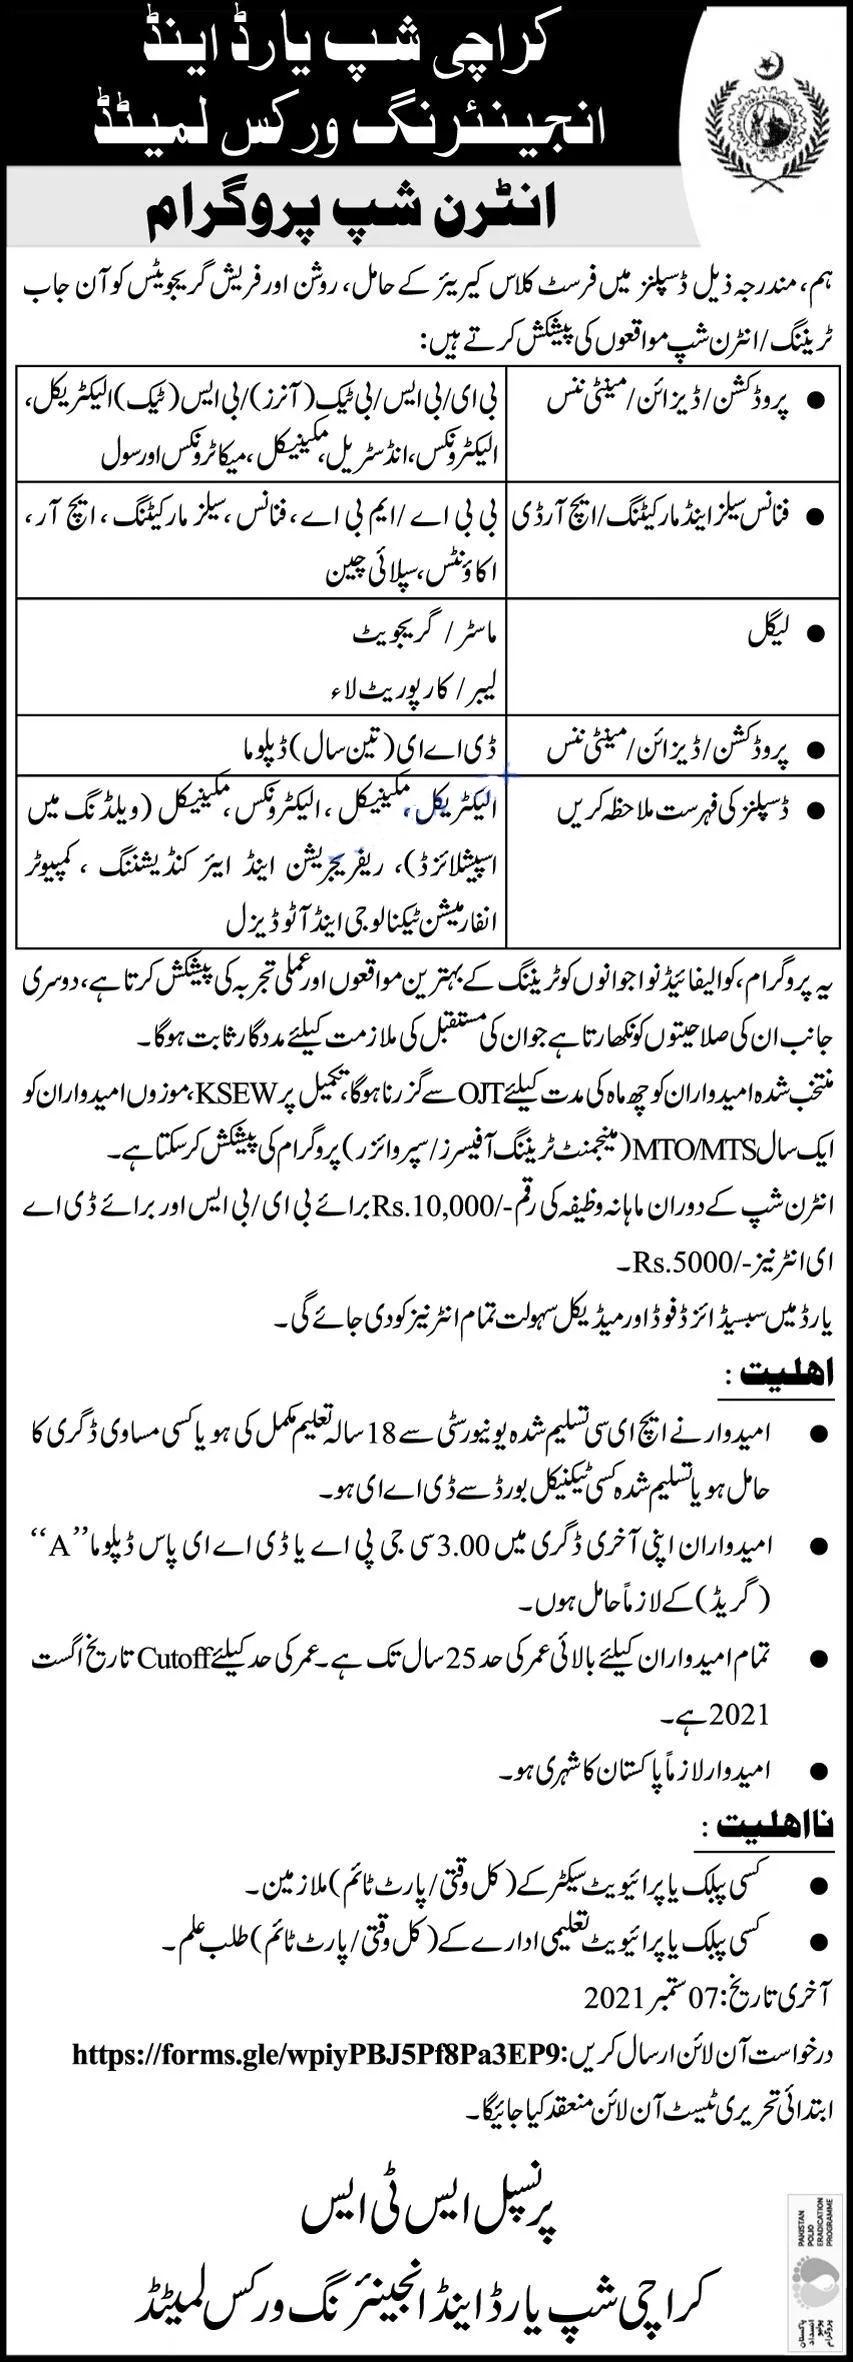 Karachi Shipyard & Engineering Works Limited KSEW Karachi Jobs 2021